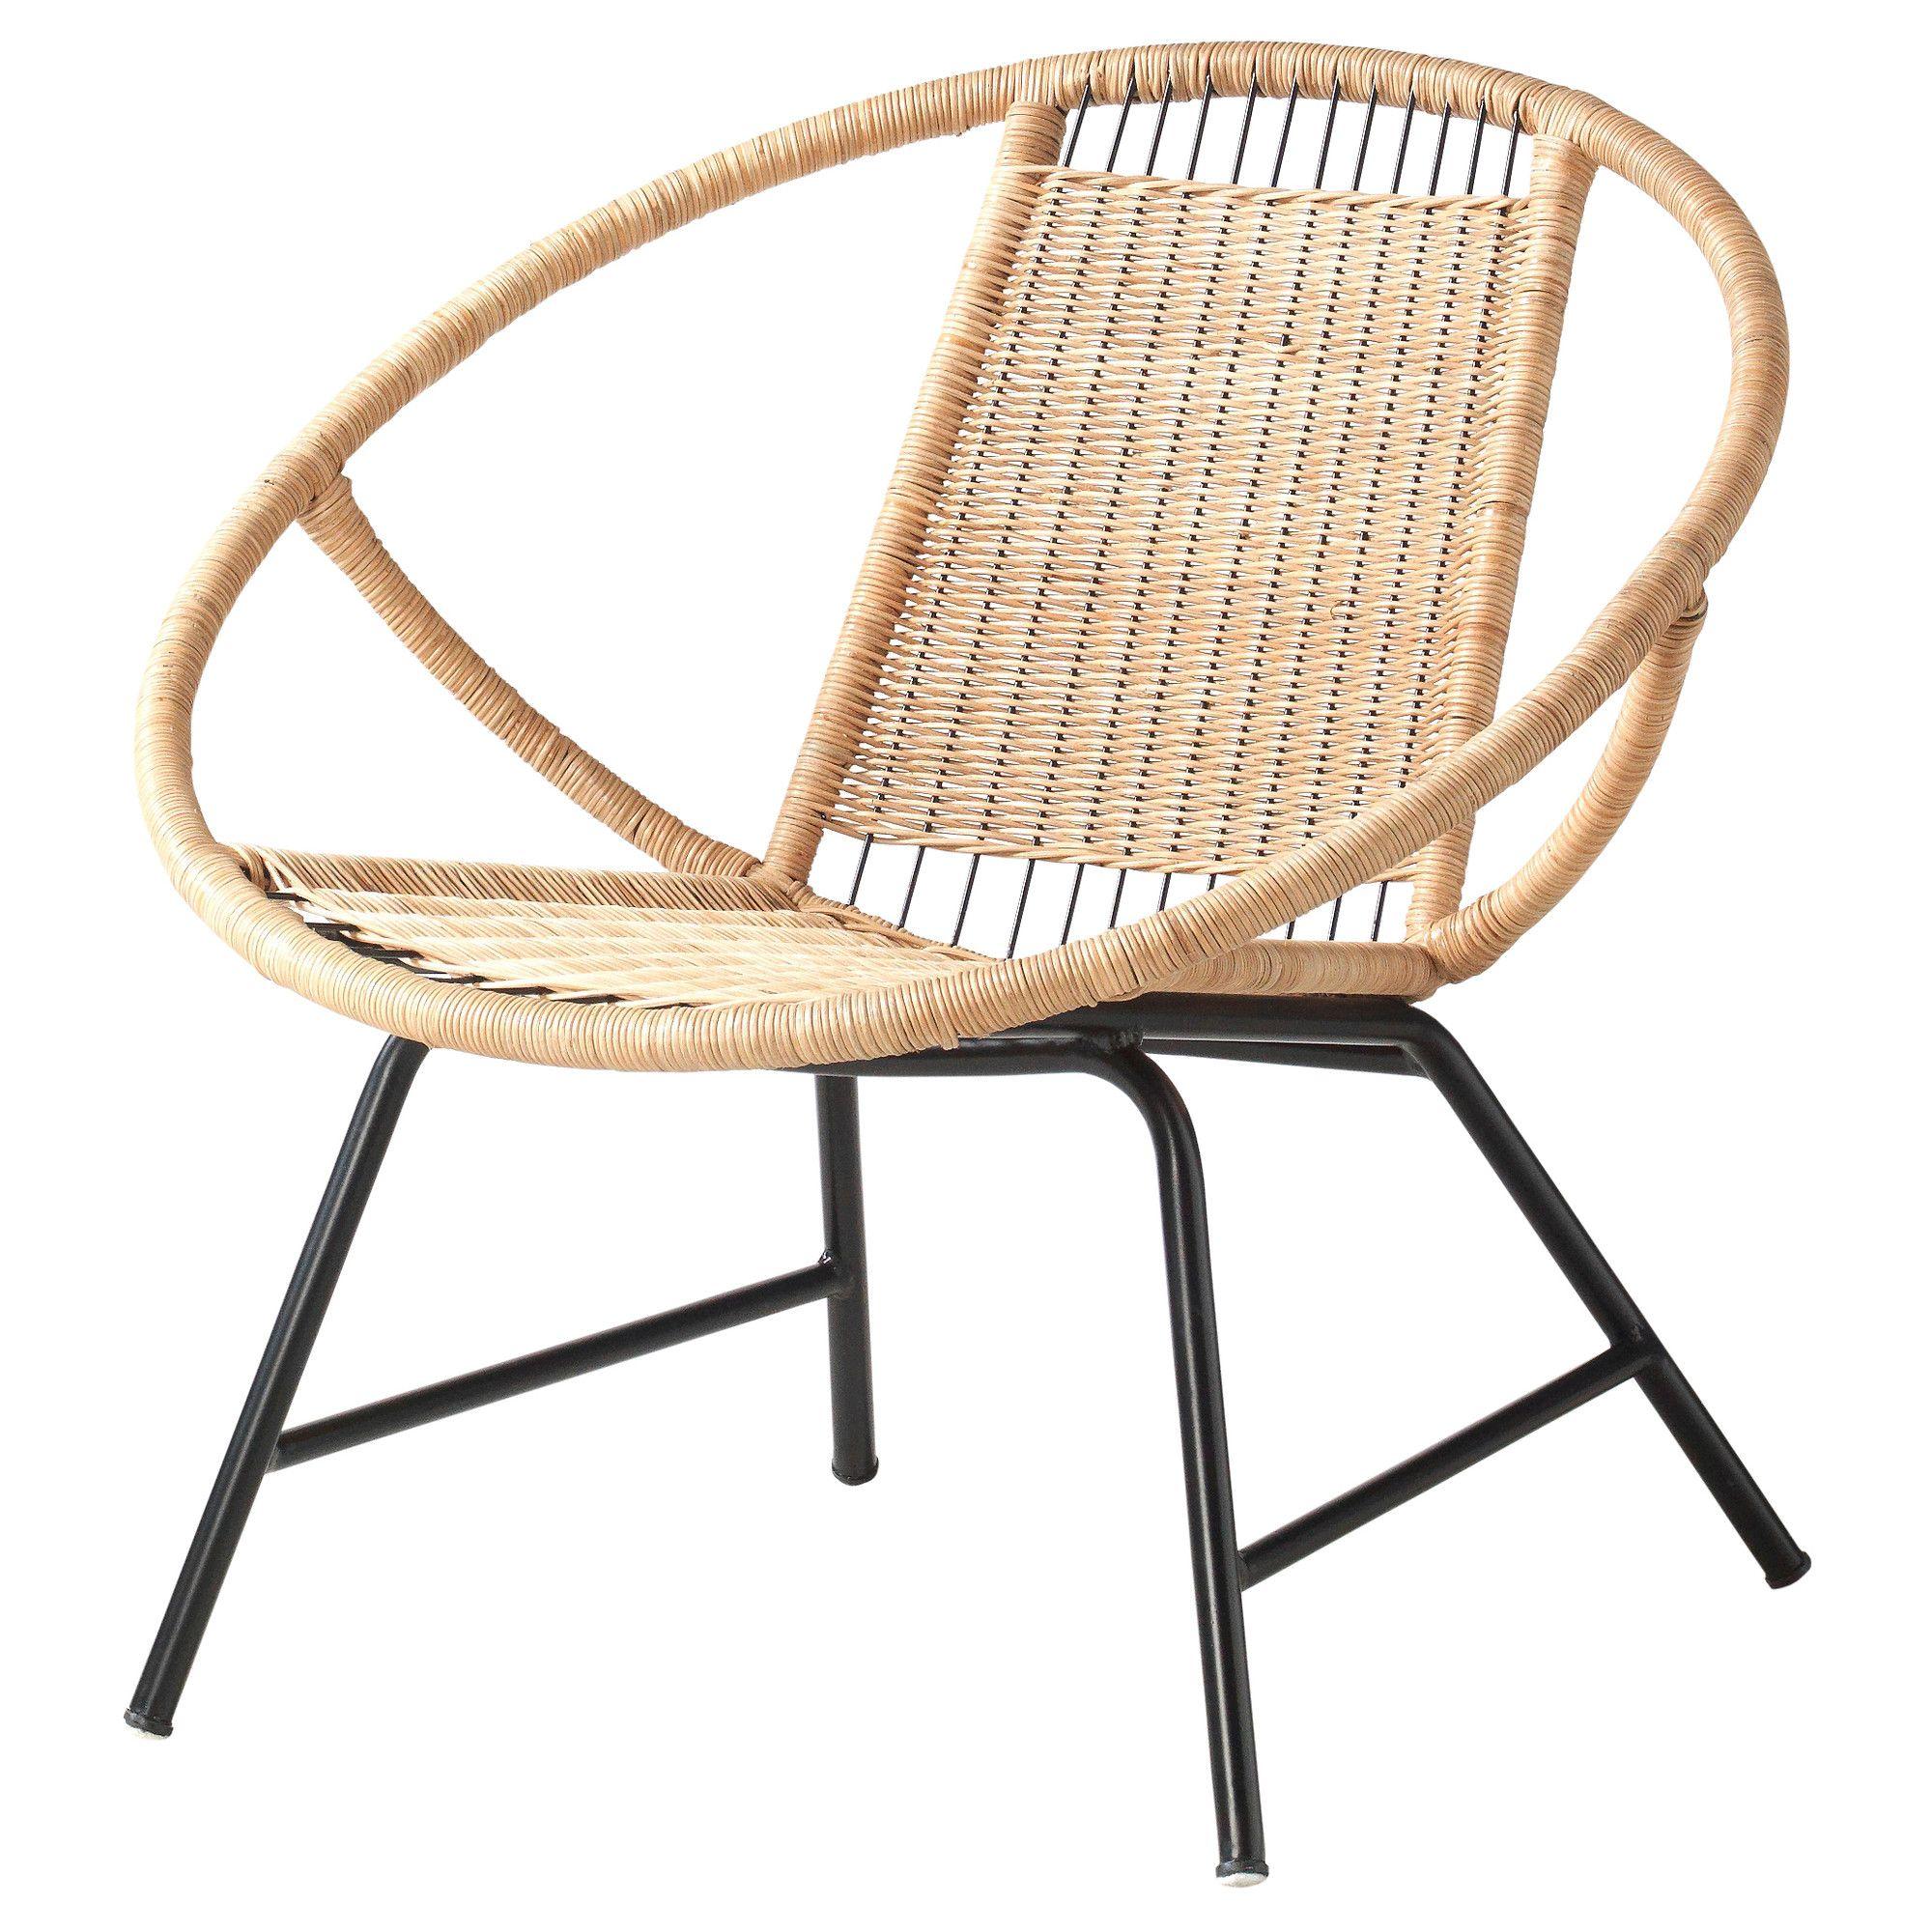 Basket chair ikea - Gagnet Lepotuoli Ikea Rattan Chairsrattan